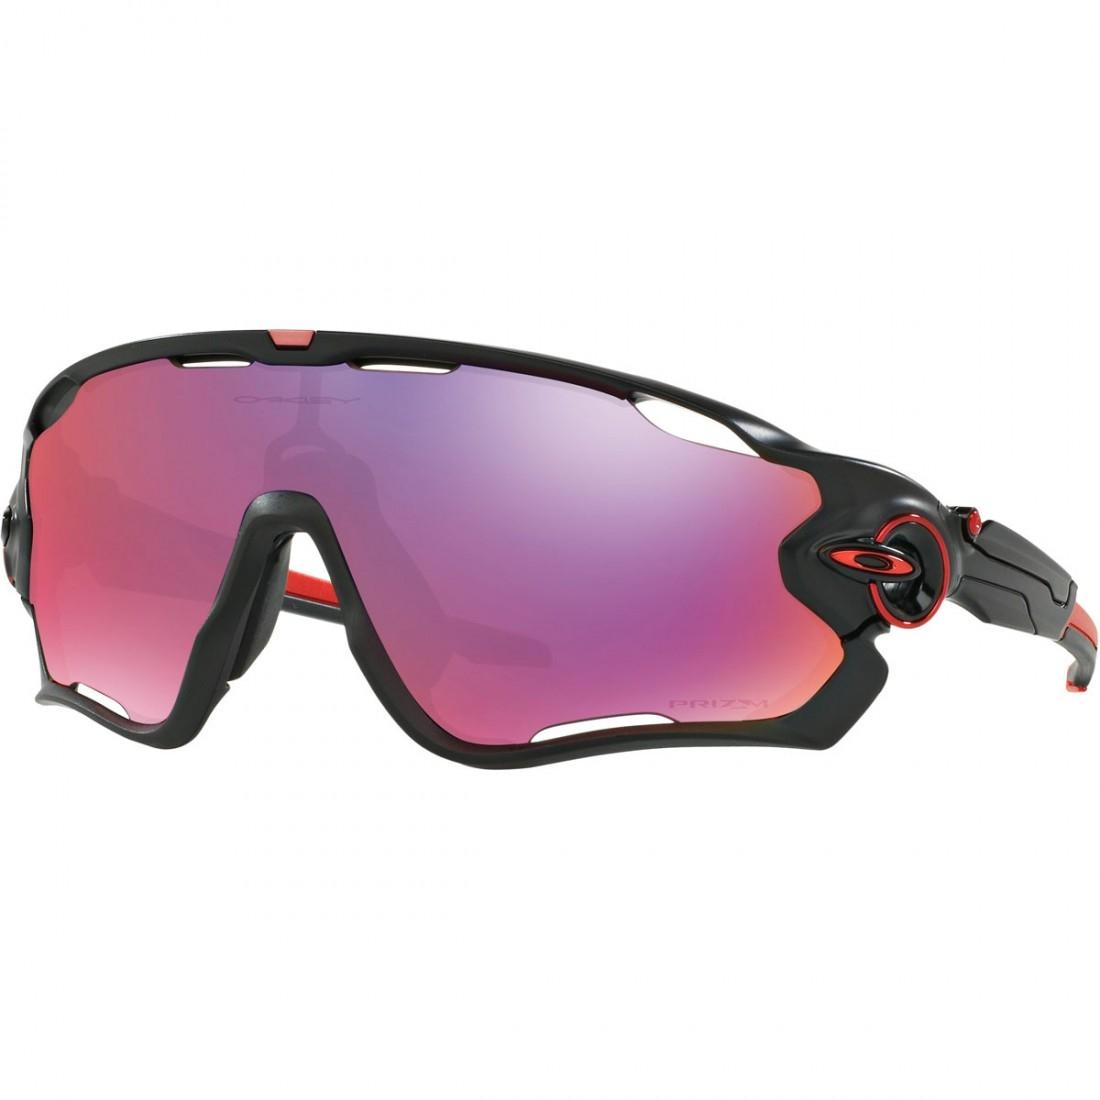 7de9086357 OAKLEY Jawbreaker Matte Black   Prizm Road Mask   Goggle · Motocard